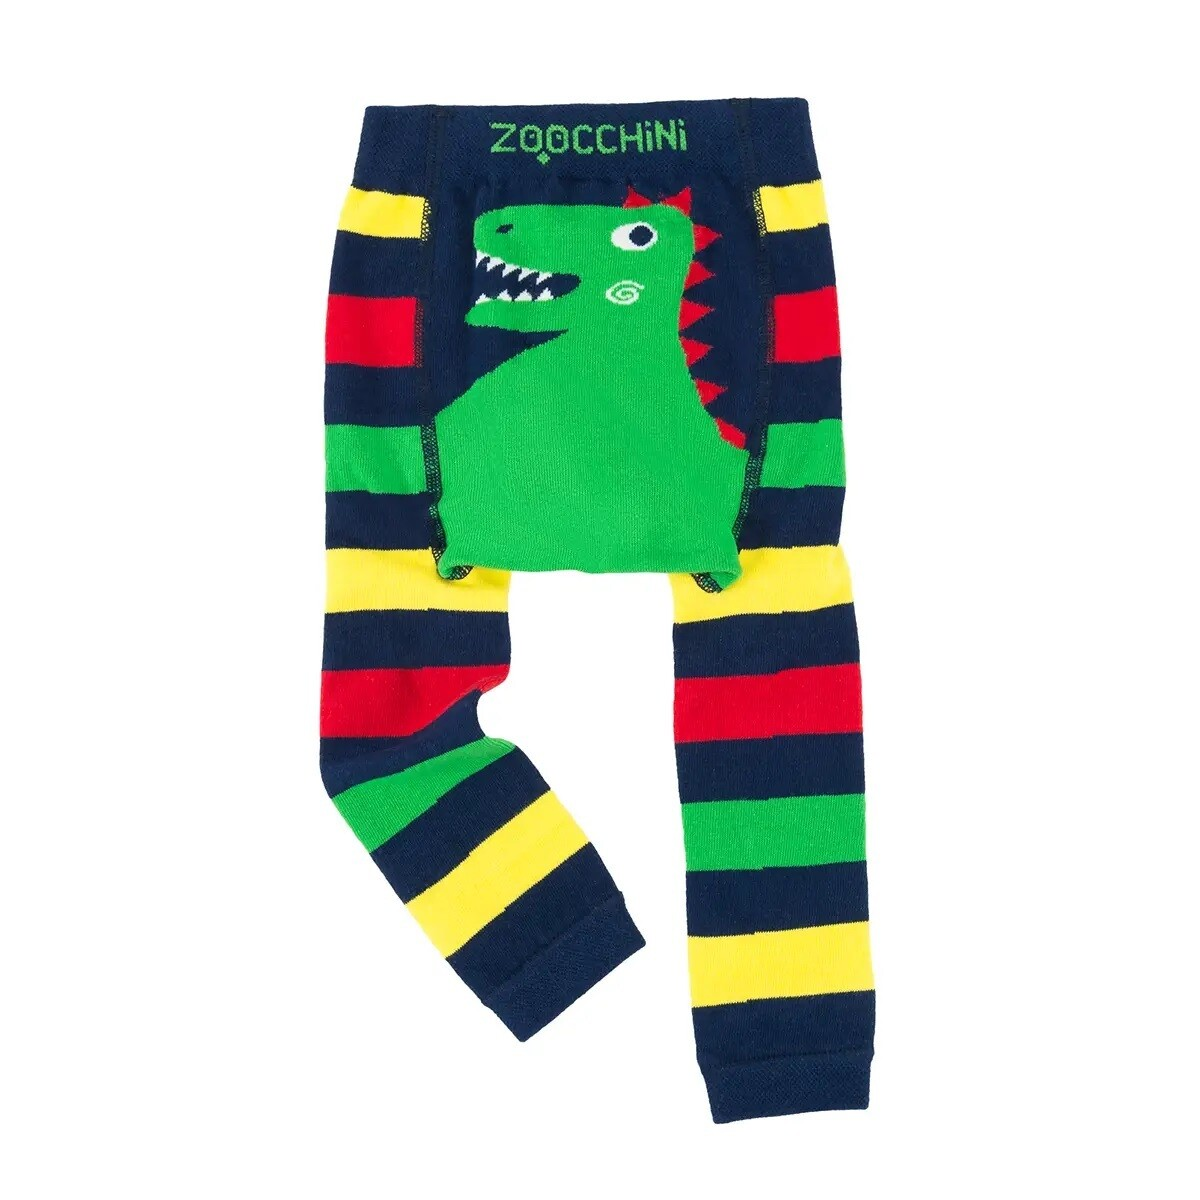 ZooCChini Devin the Dinosaur Legging & Sock Set